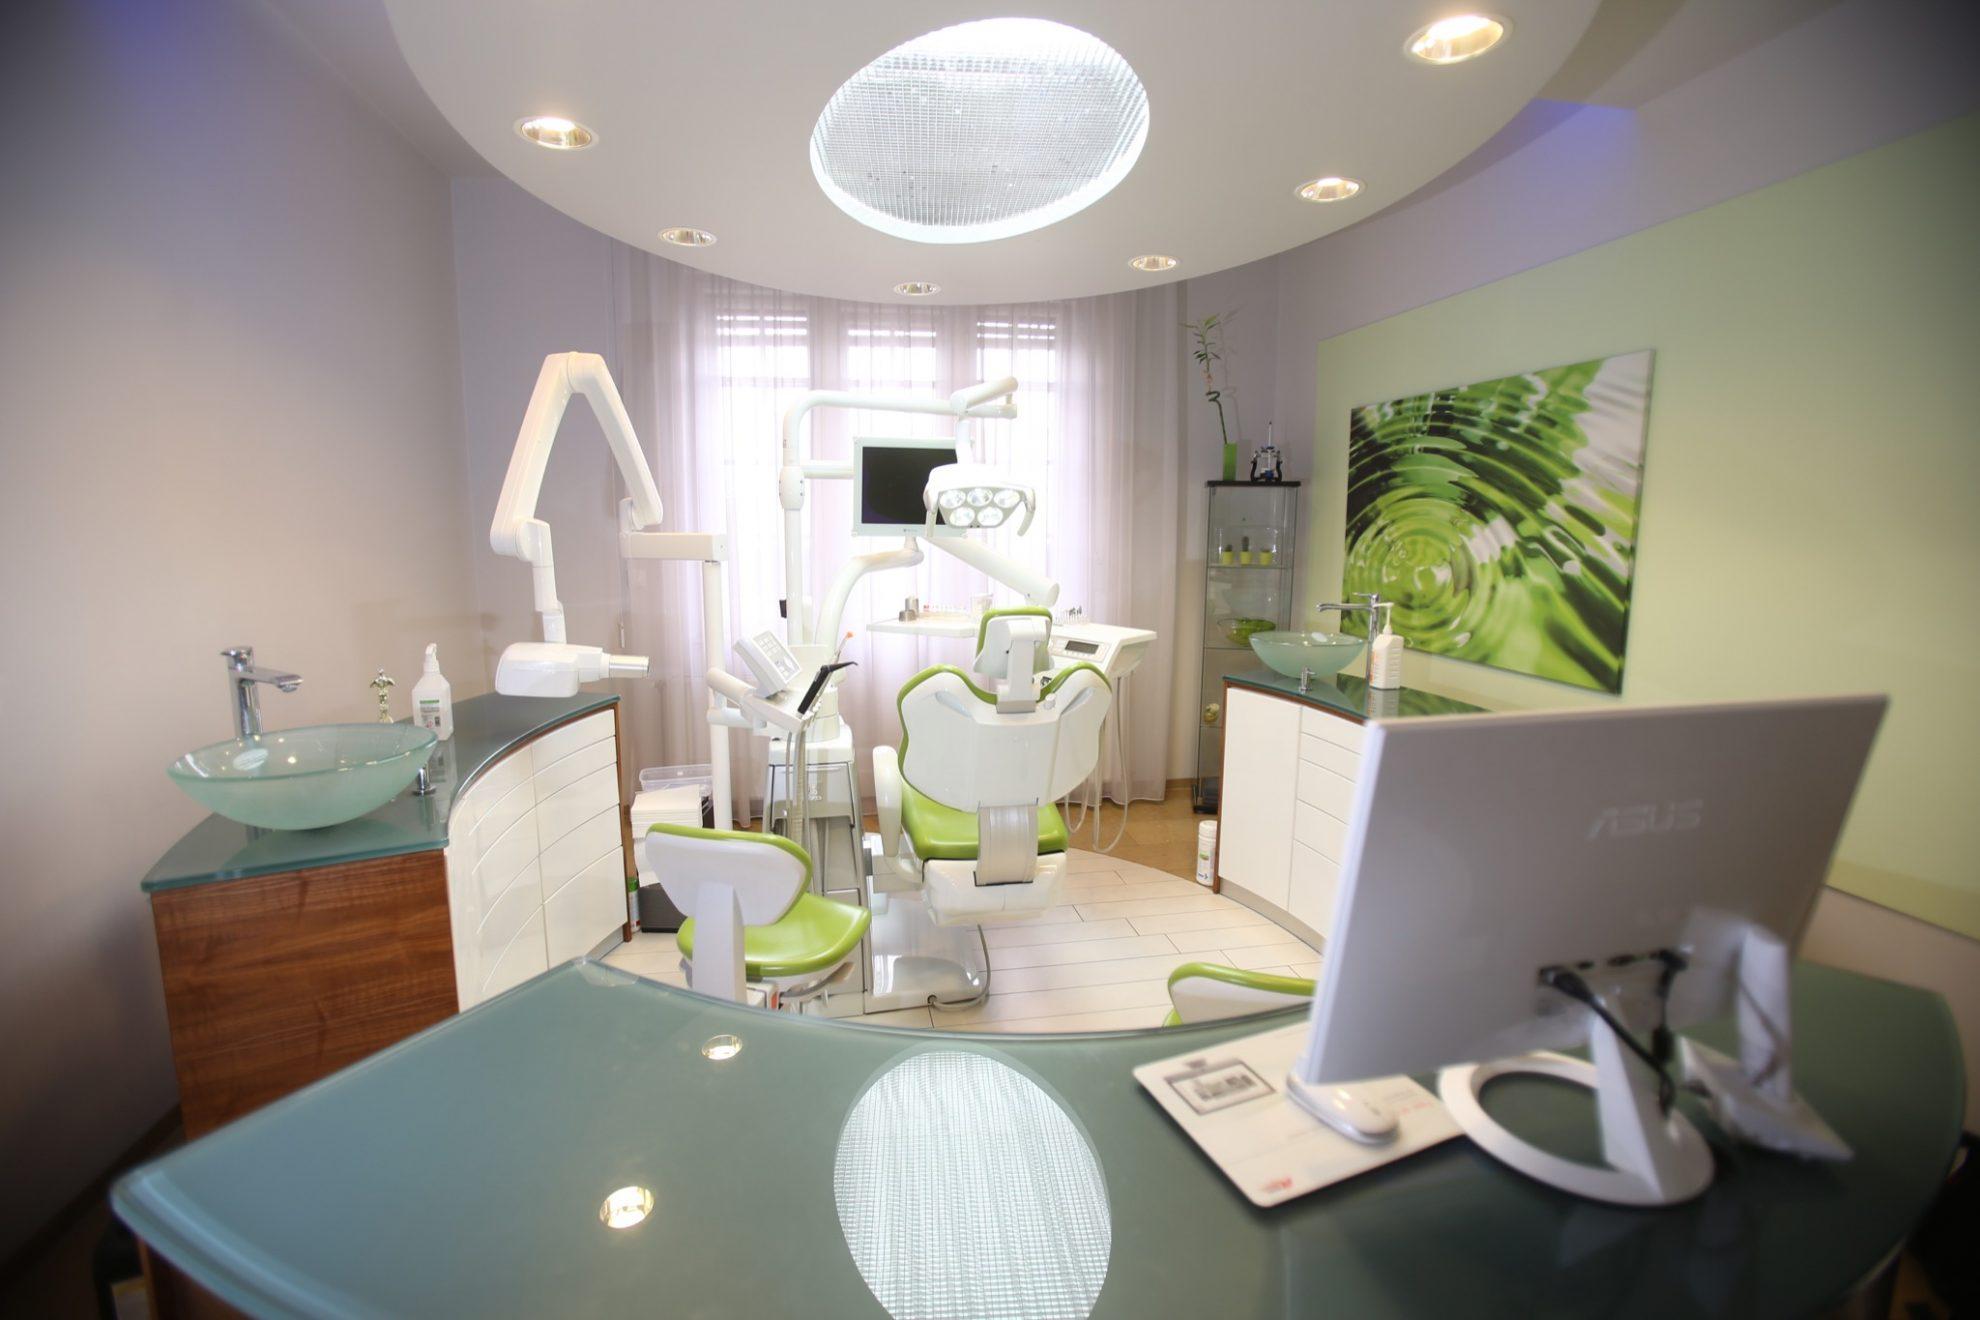 clinique dentaire soins dentaires